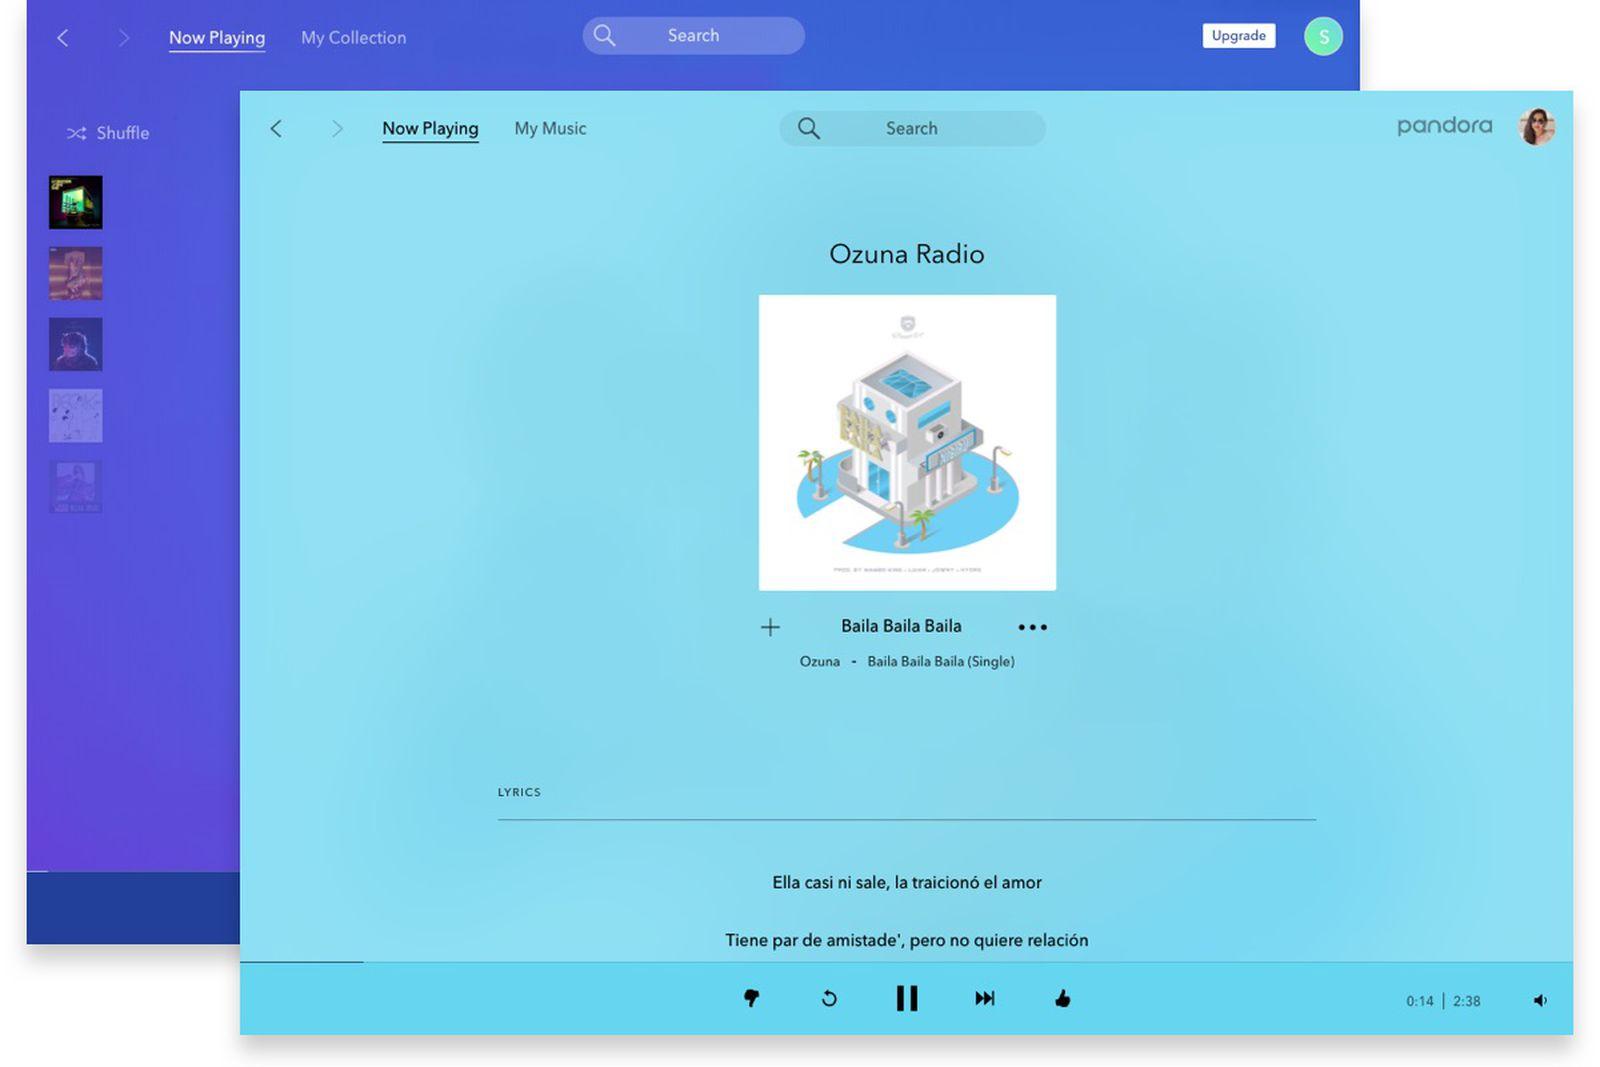 Pandora Launches New Desktop App for Mac - MacRumors